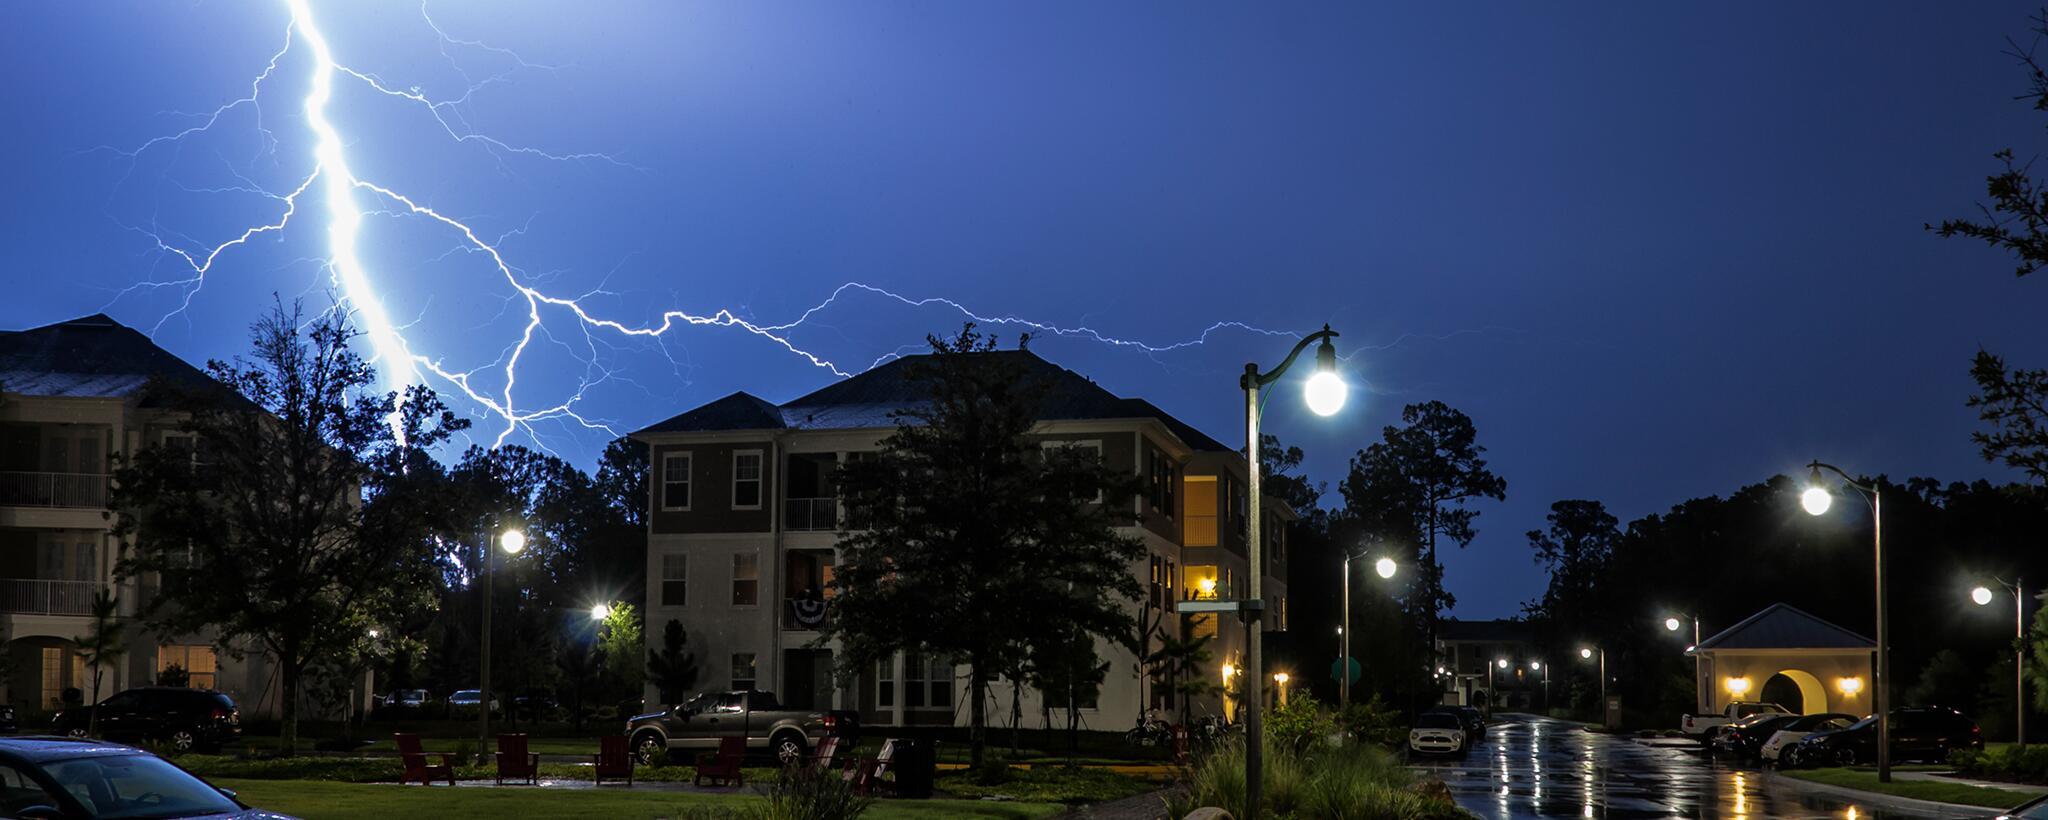 thunderstorms lightning ready gov